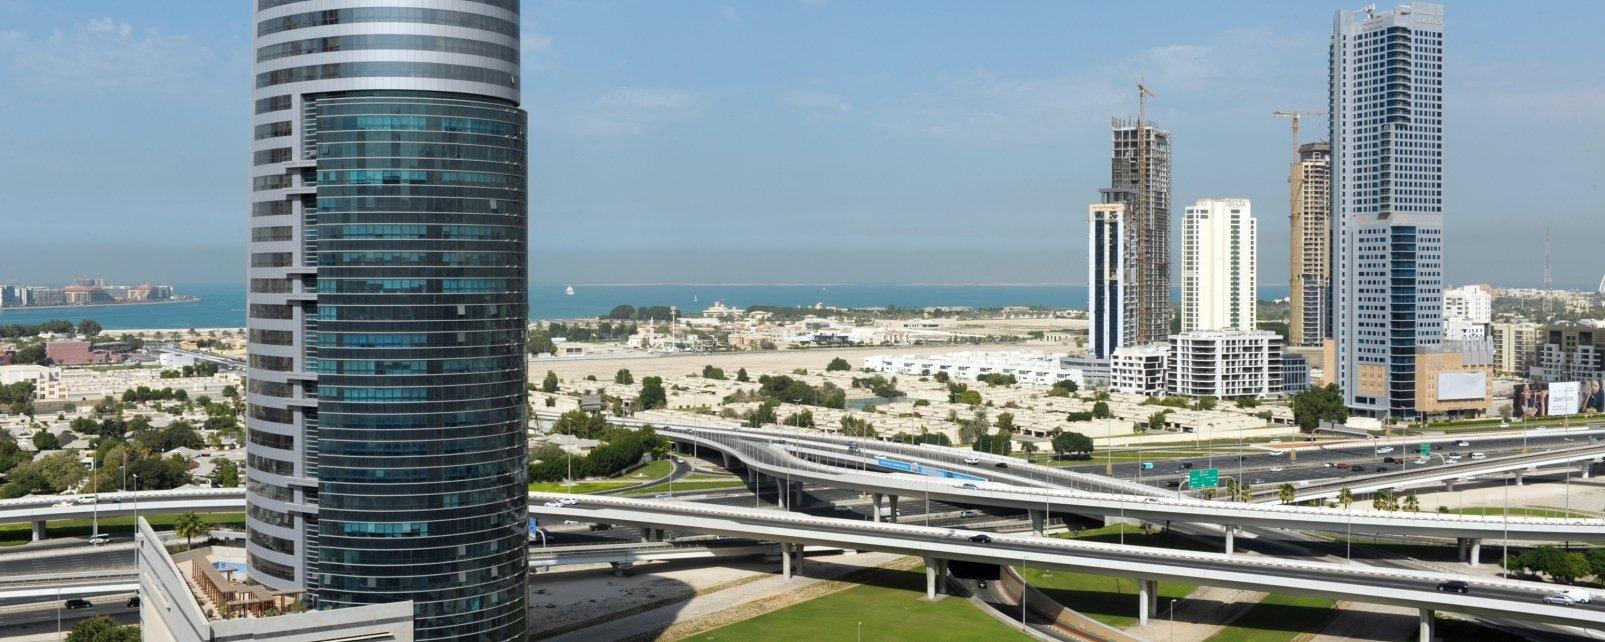 Hôtel Grand Millennium Dubai